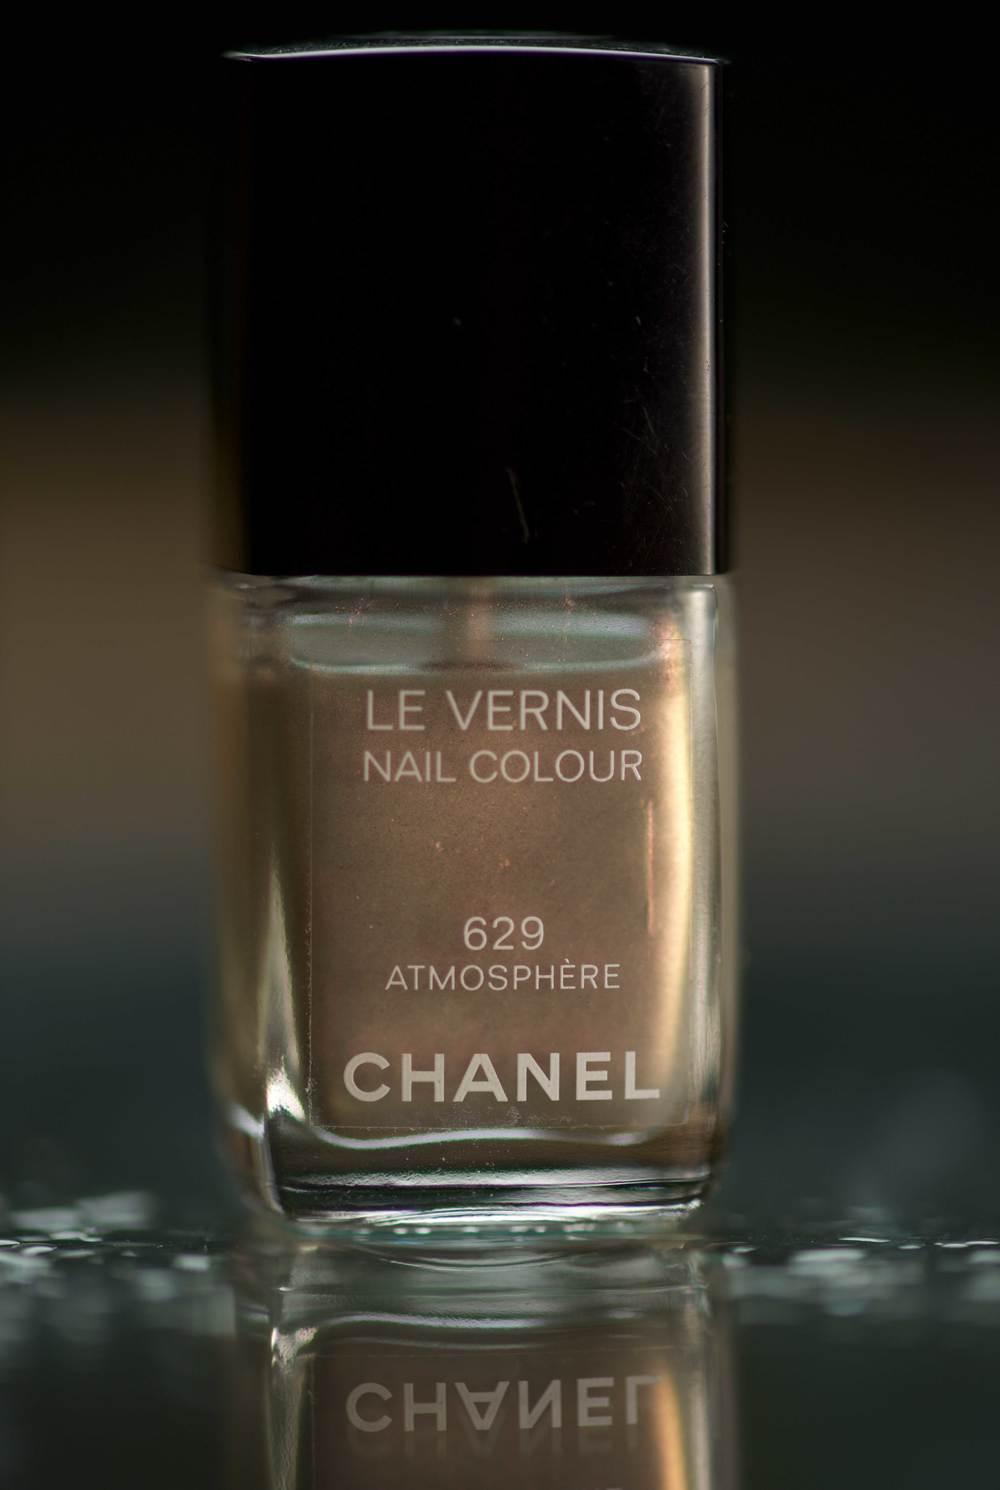 #Chanel Nail Color Le Vernis 629 in silver light,Image©gunjanvirk